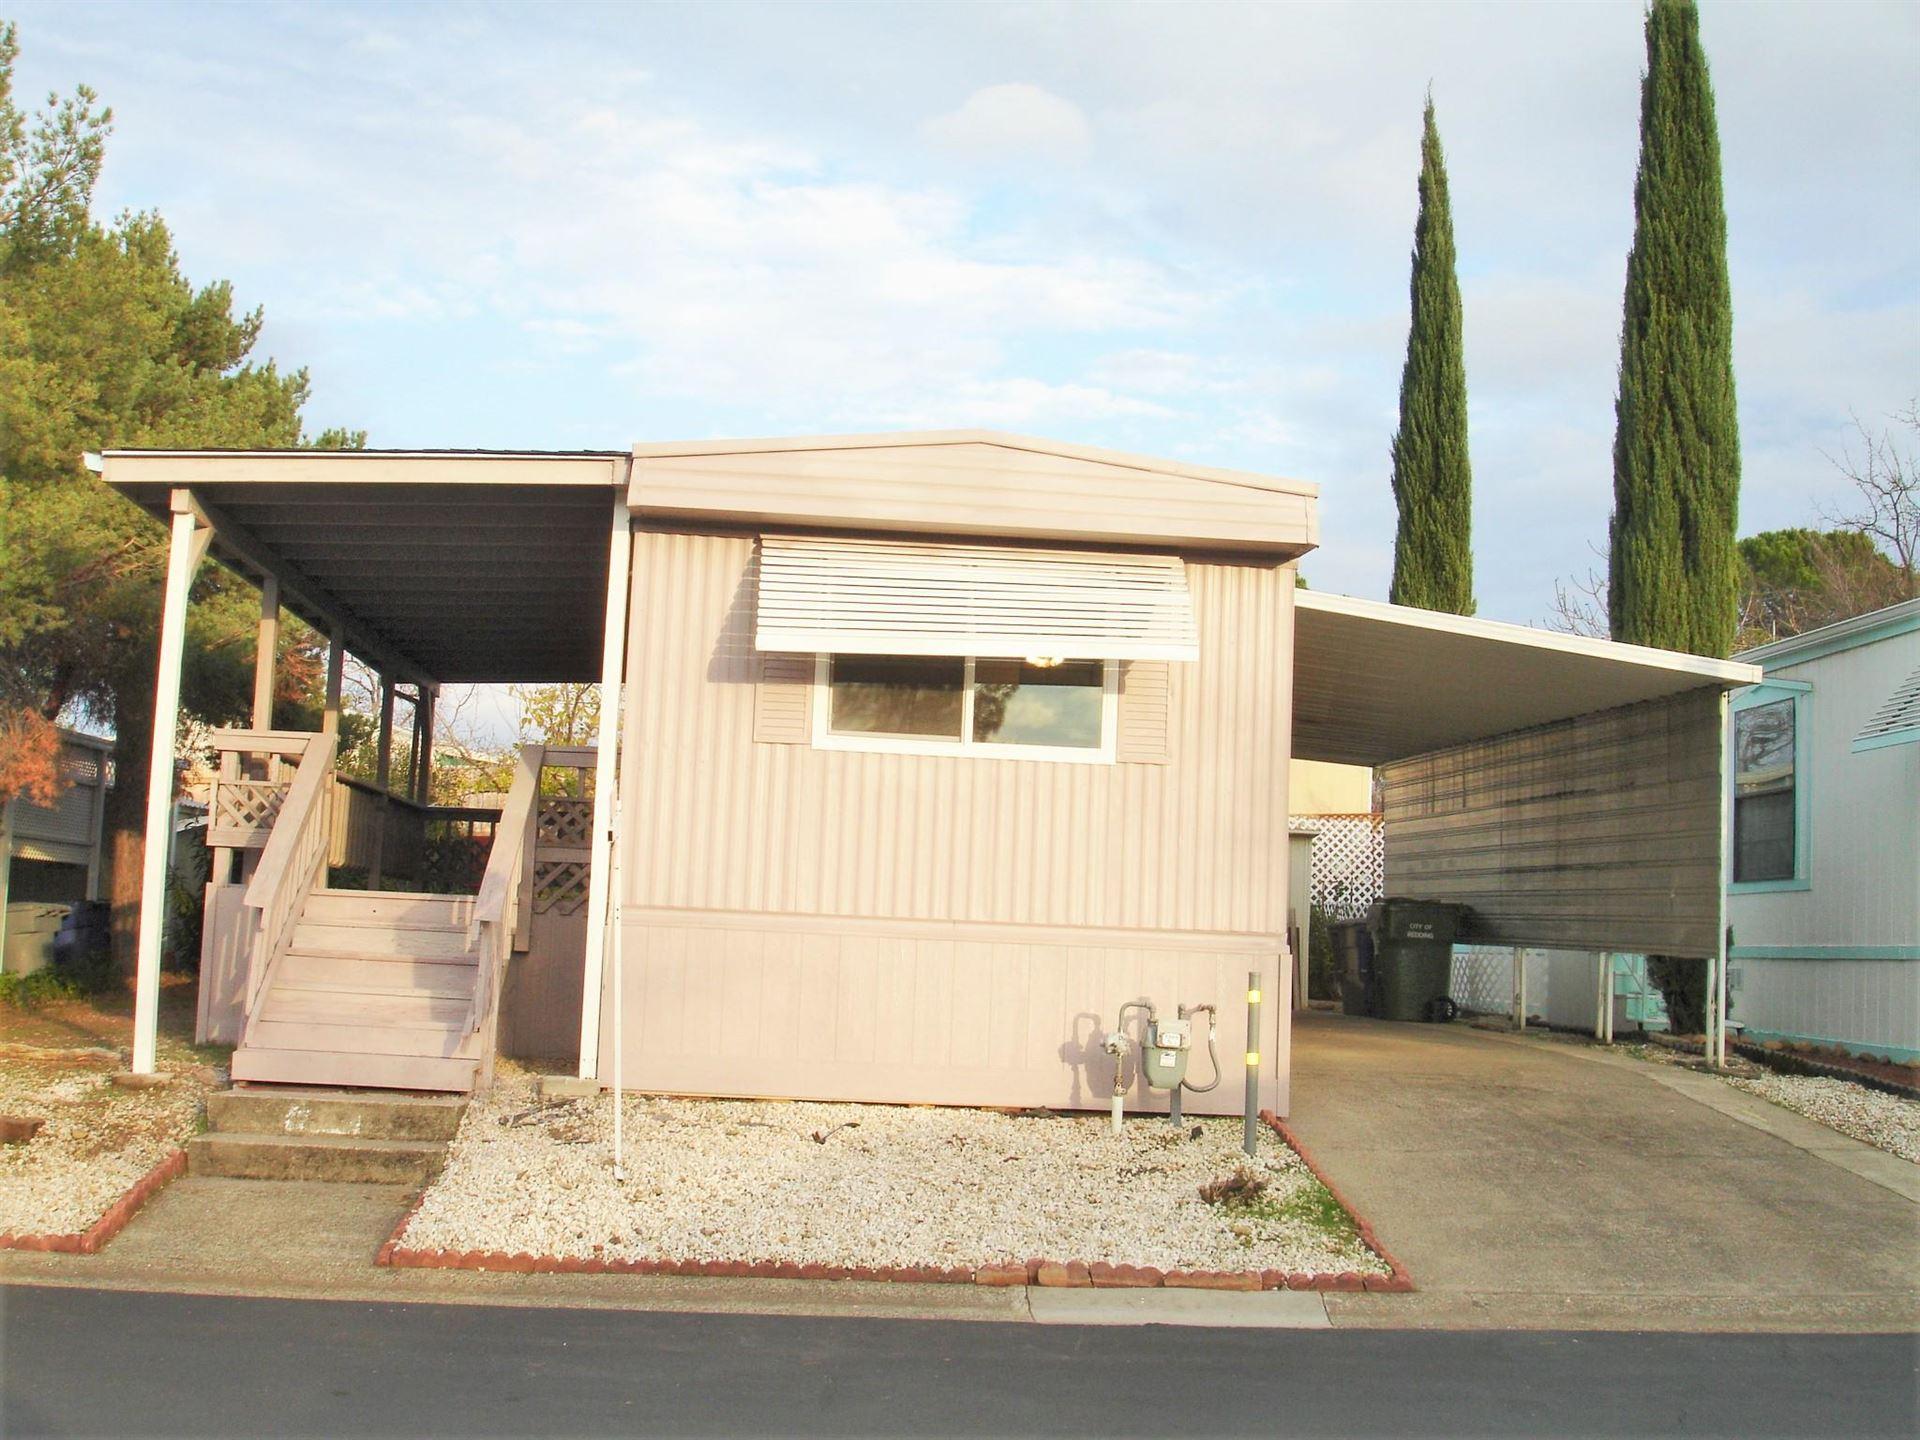 895 Shawnee Trl, Redding, CA 96003 - MLS#: 20-4240